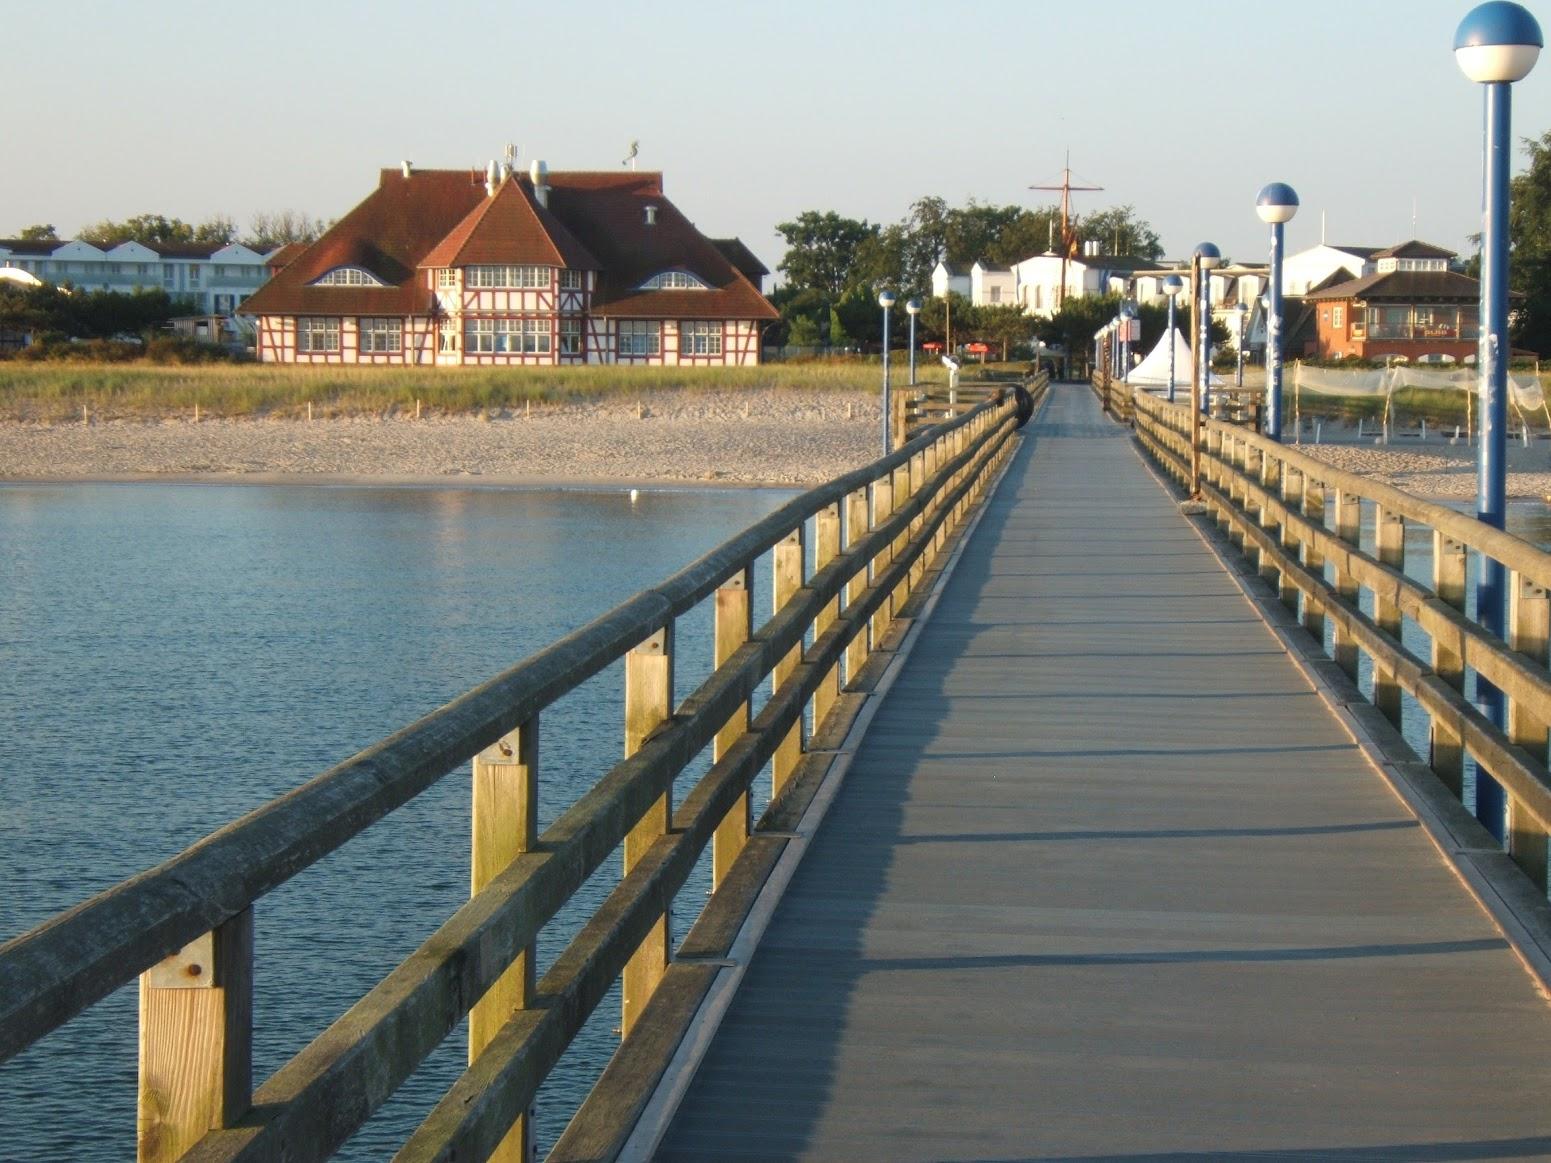 Zingst Seebrücke